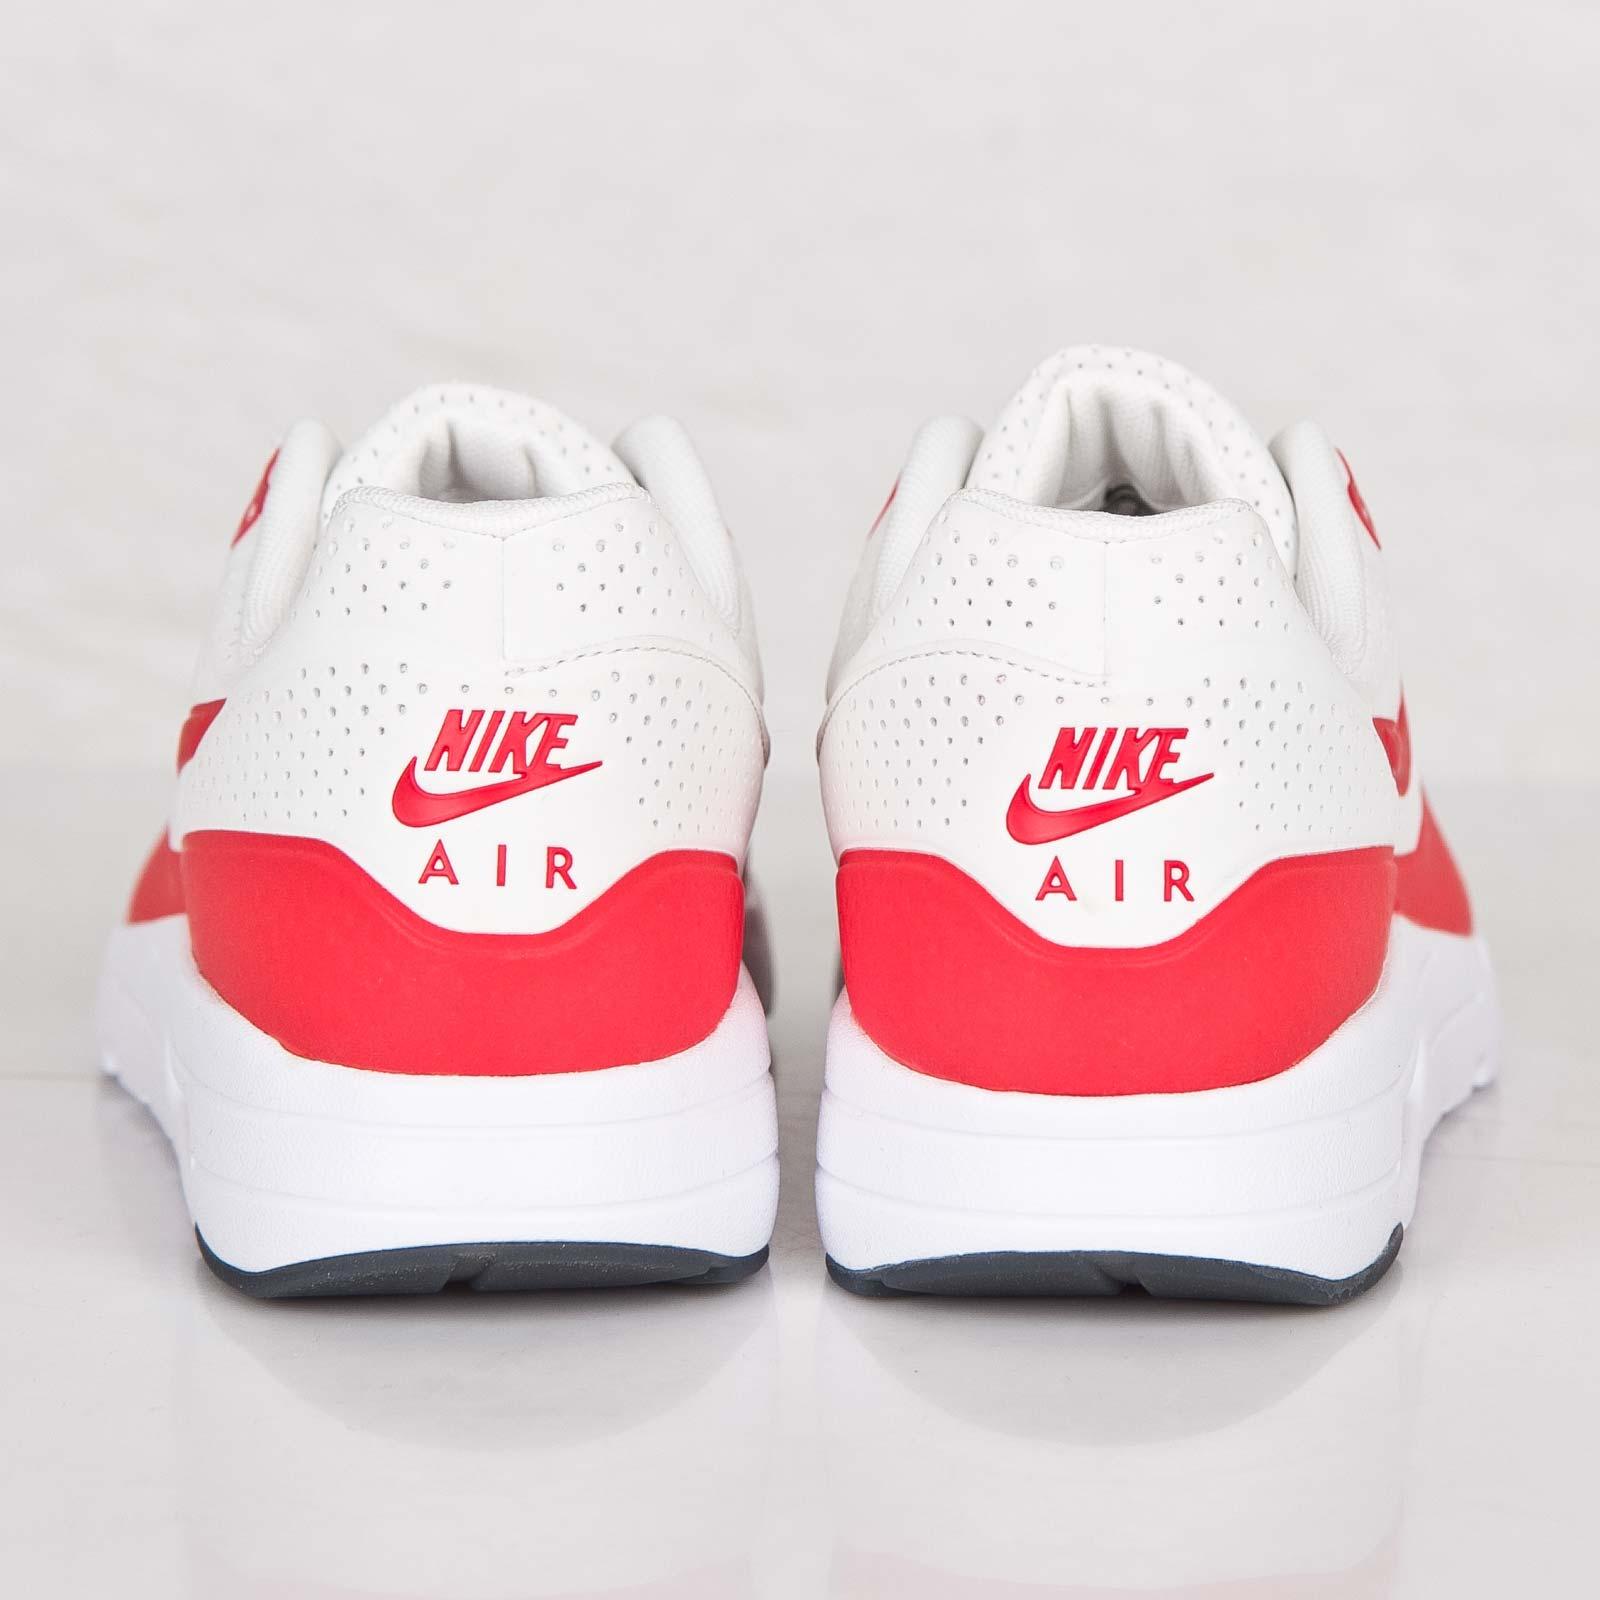 536db4b809 Nike Air Max 1 Ultra Moire - 705297-106 - Sneakersnstuff | sneakers &  streetwear online since 1999